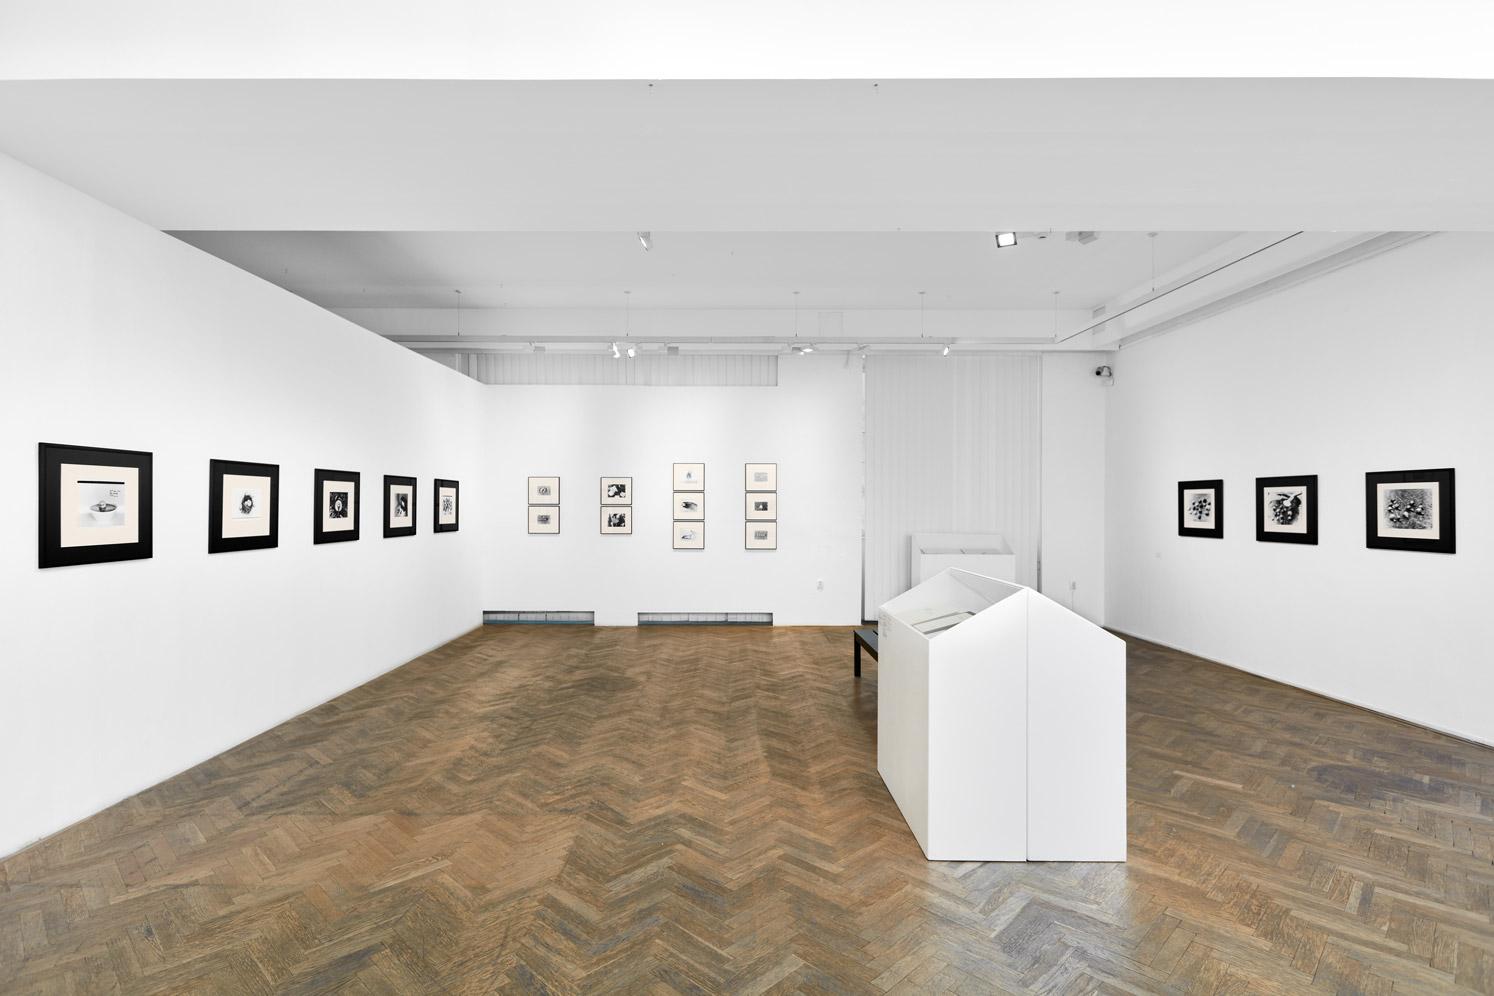 Géza Perneczky, Mirrors Exhibition at Robert Capa Center, Budapest